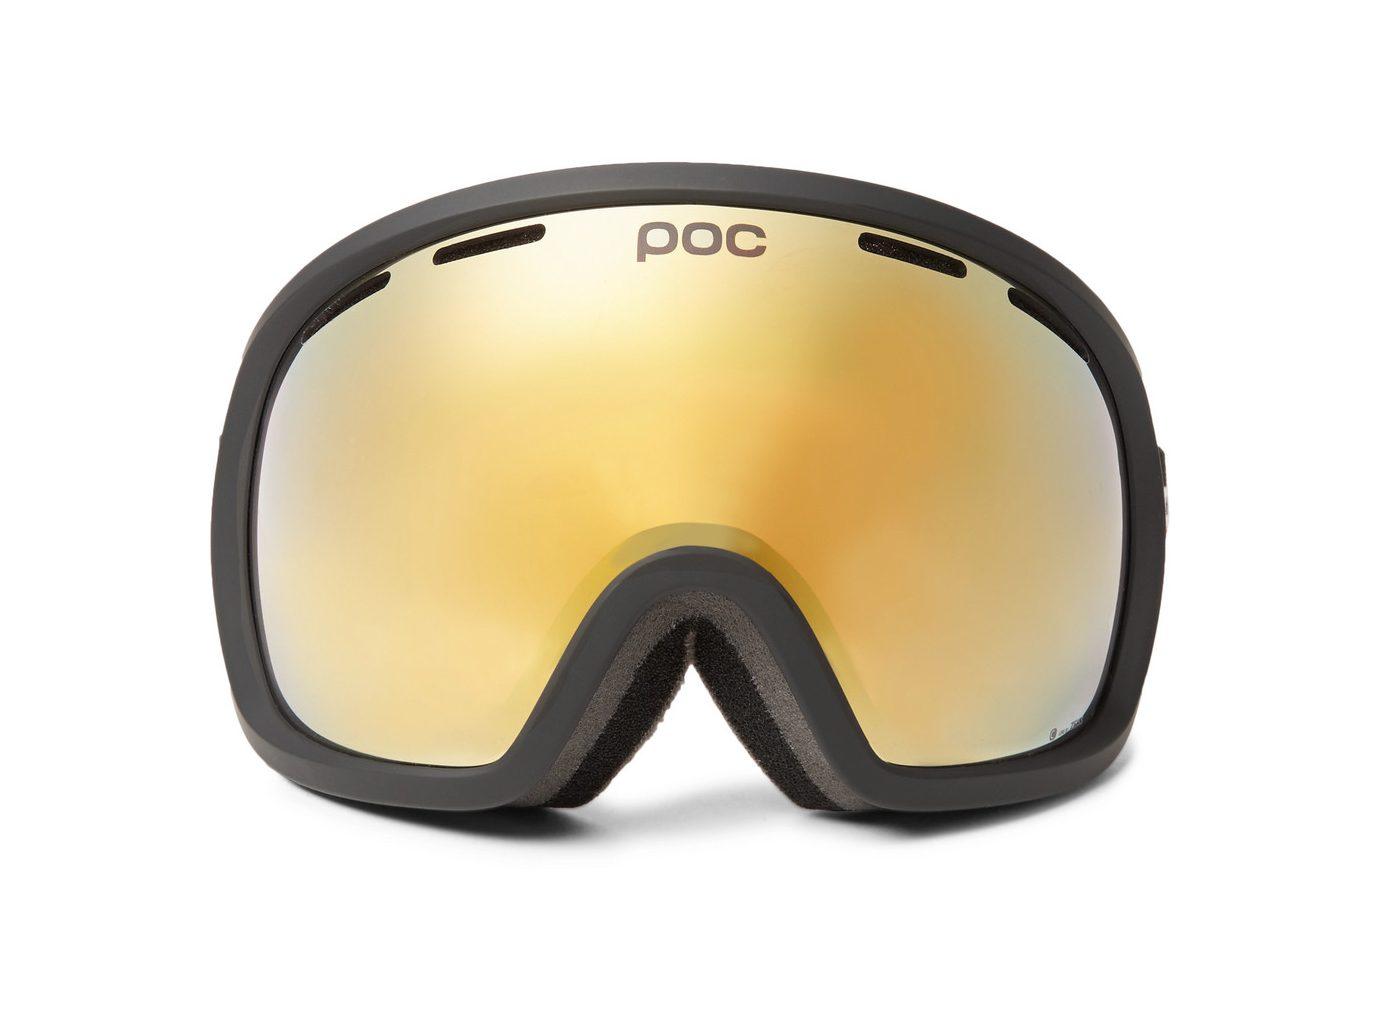 POC Fovea Clarity Jeremy Jones Edition Ski Goggles